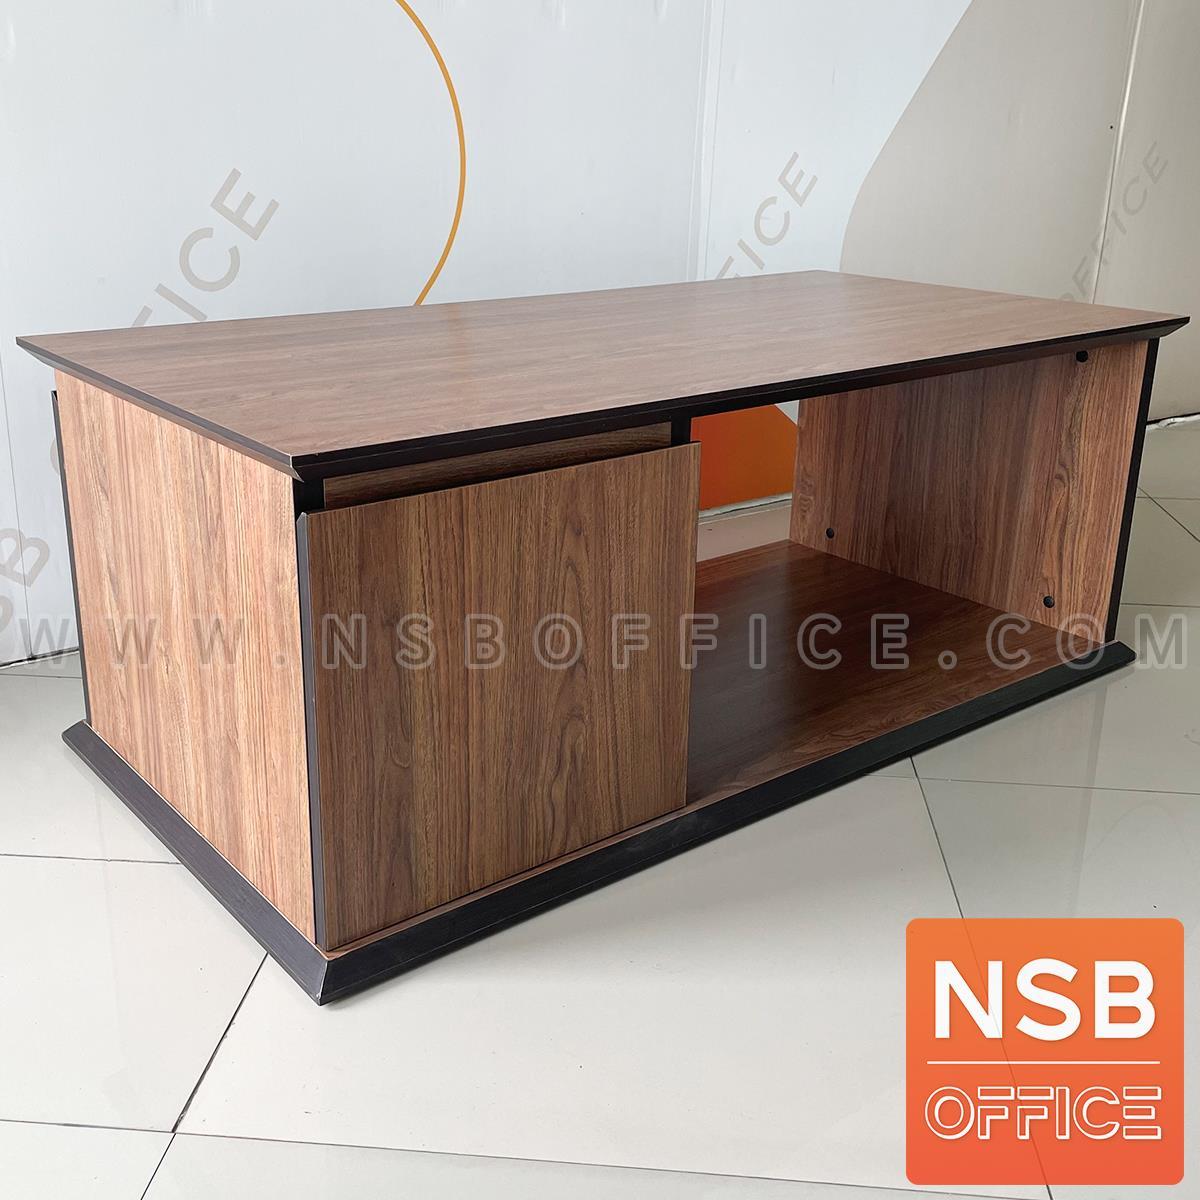 B13A305:โต๊ะกลางไม้ รุ่น Sandvick (แซนวิค) ขนาด 120W*60D cm. มีลิ้นชัก